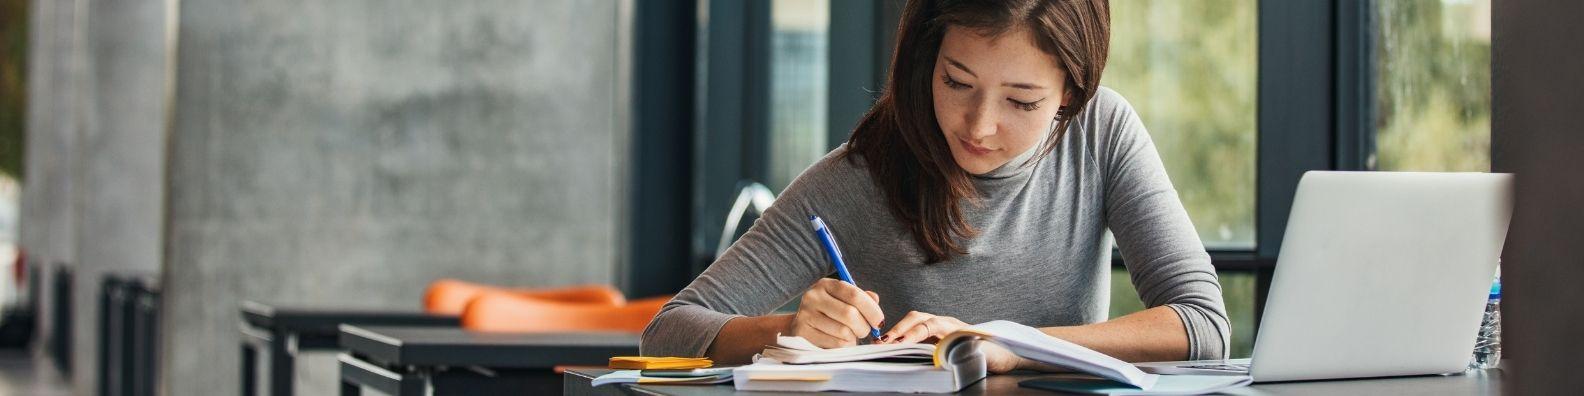 Online Insurance Exam Prep Courses